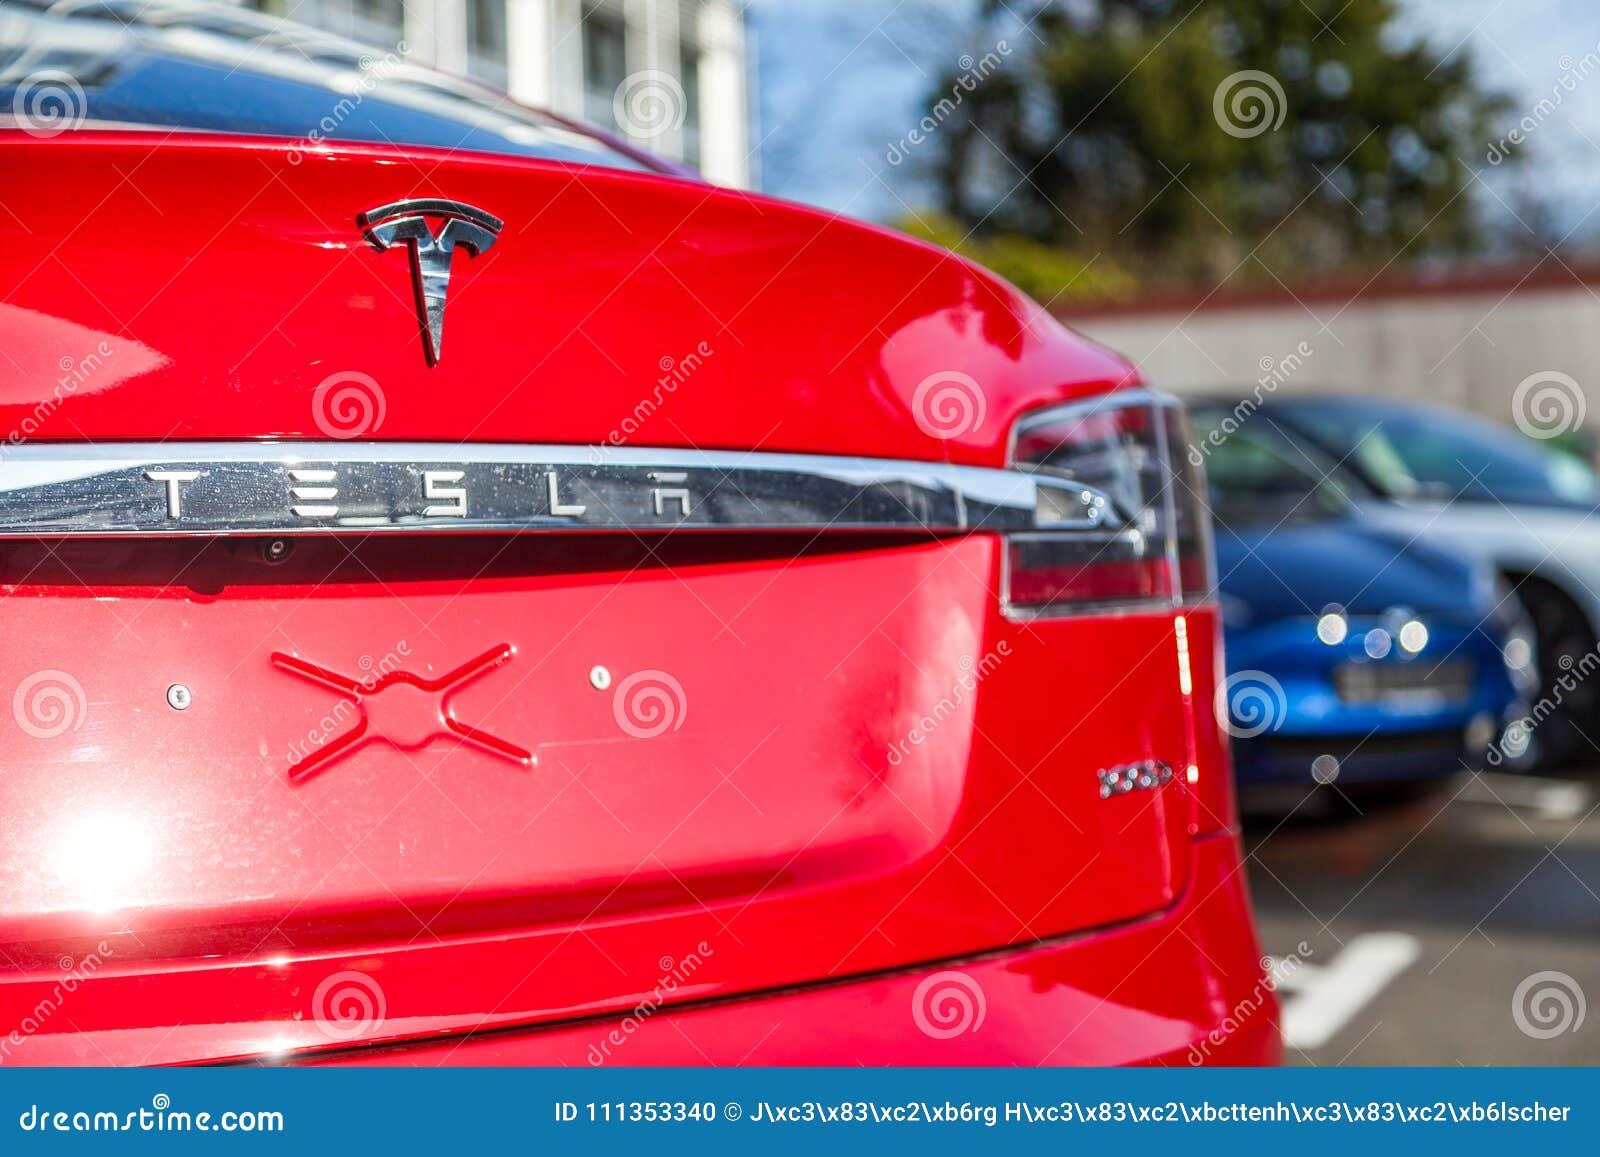 Tesla-Logo auf einem Tesla-Auto